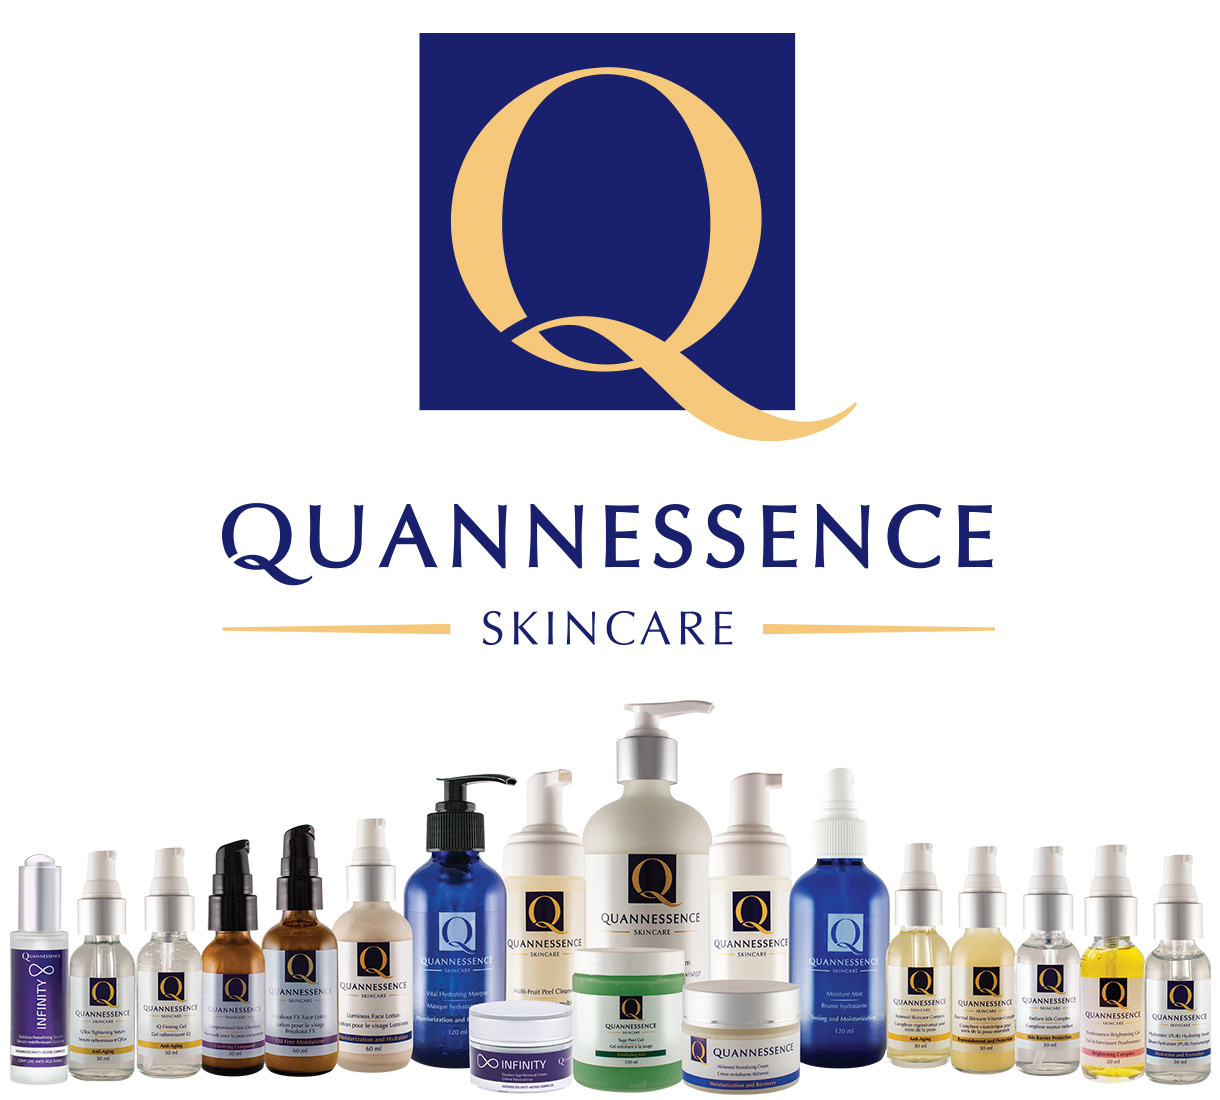 BioSpa Product Line - Quannessence